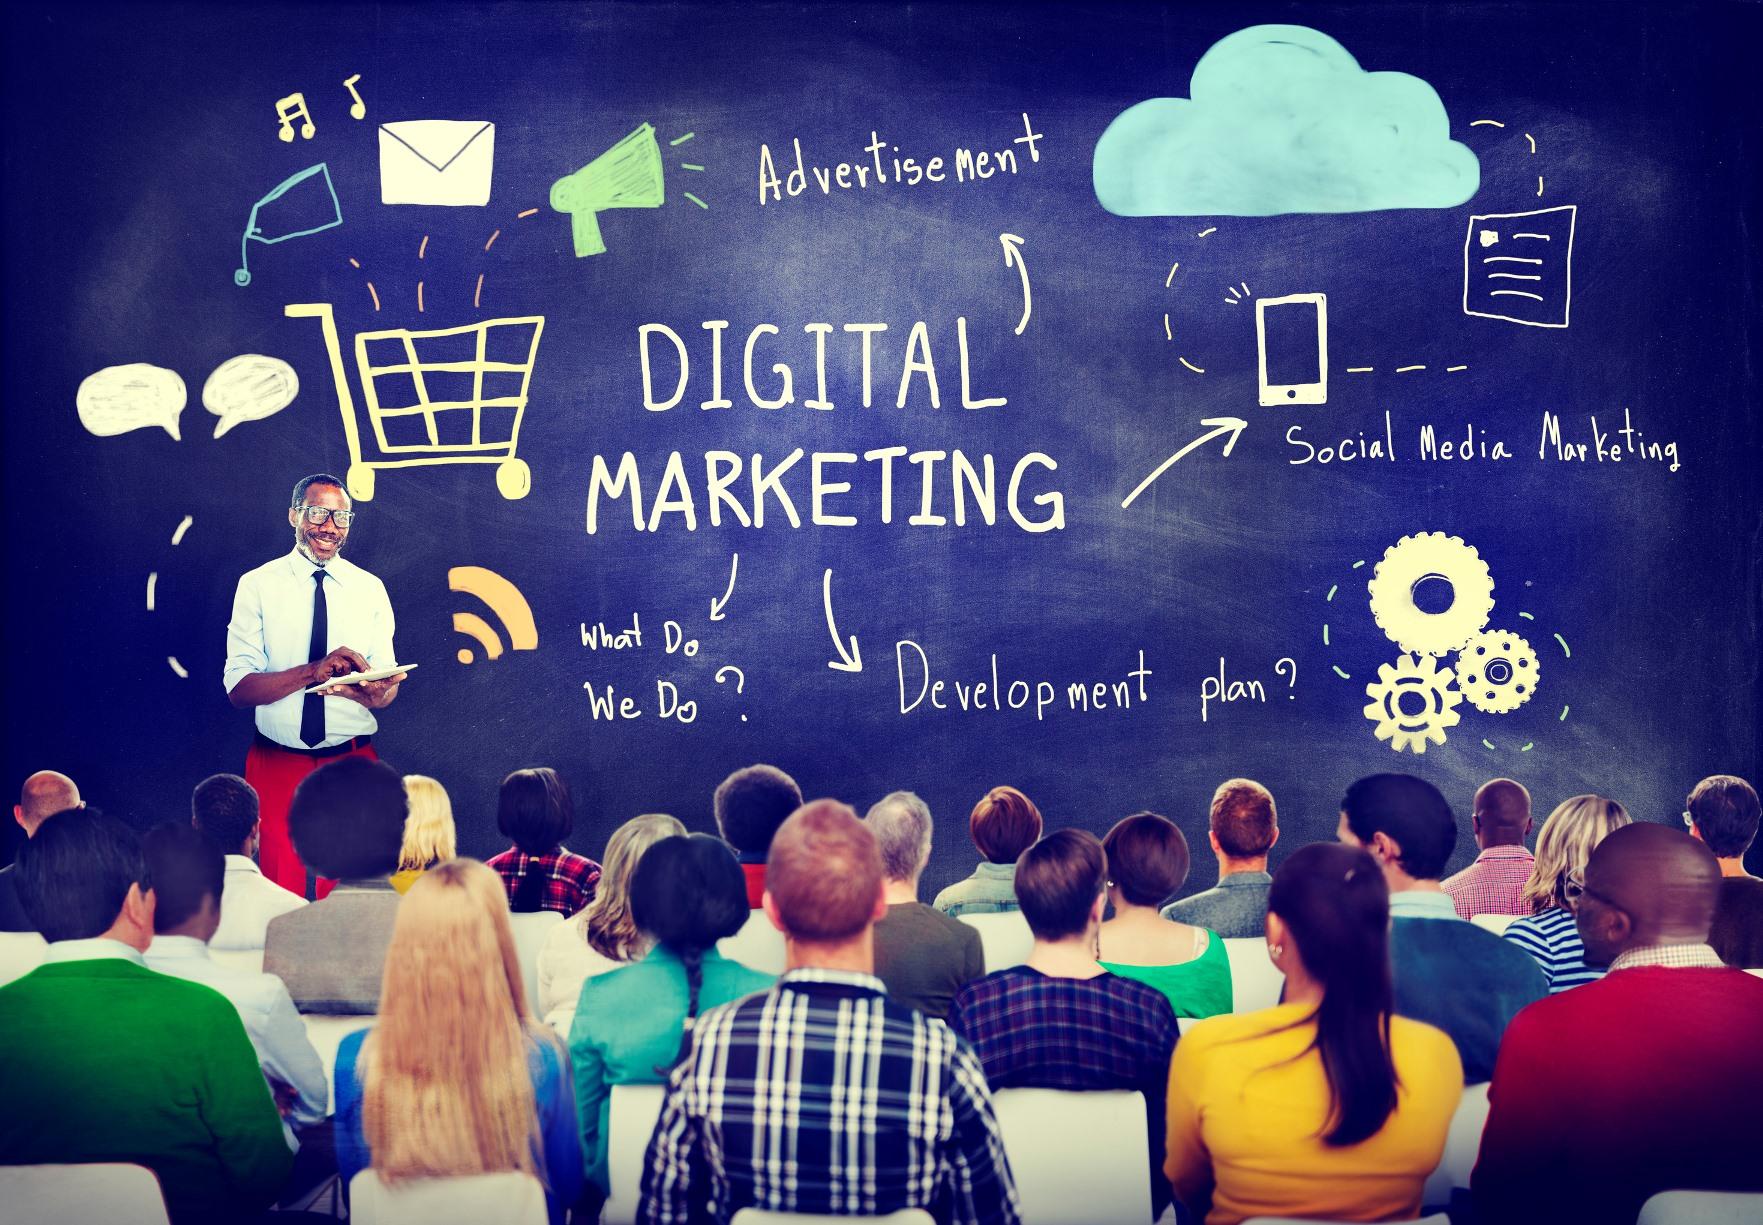 Digital Marketing and social media session